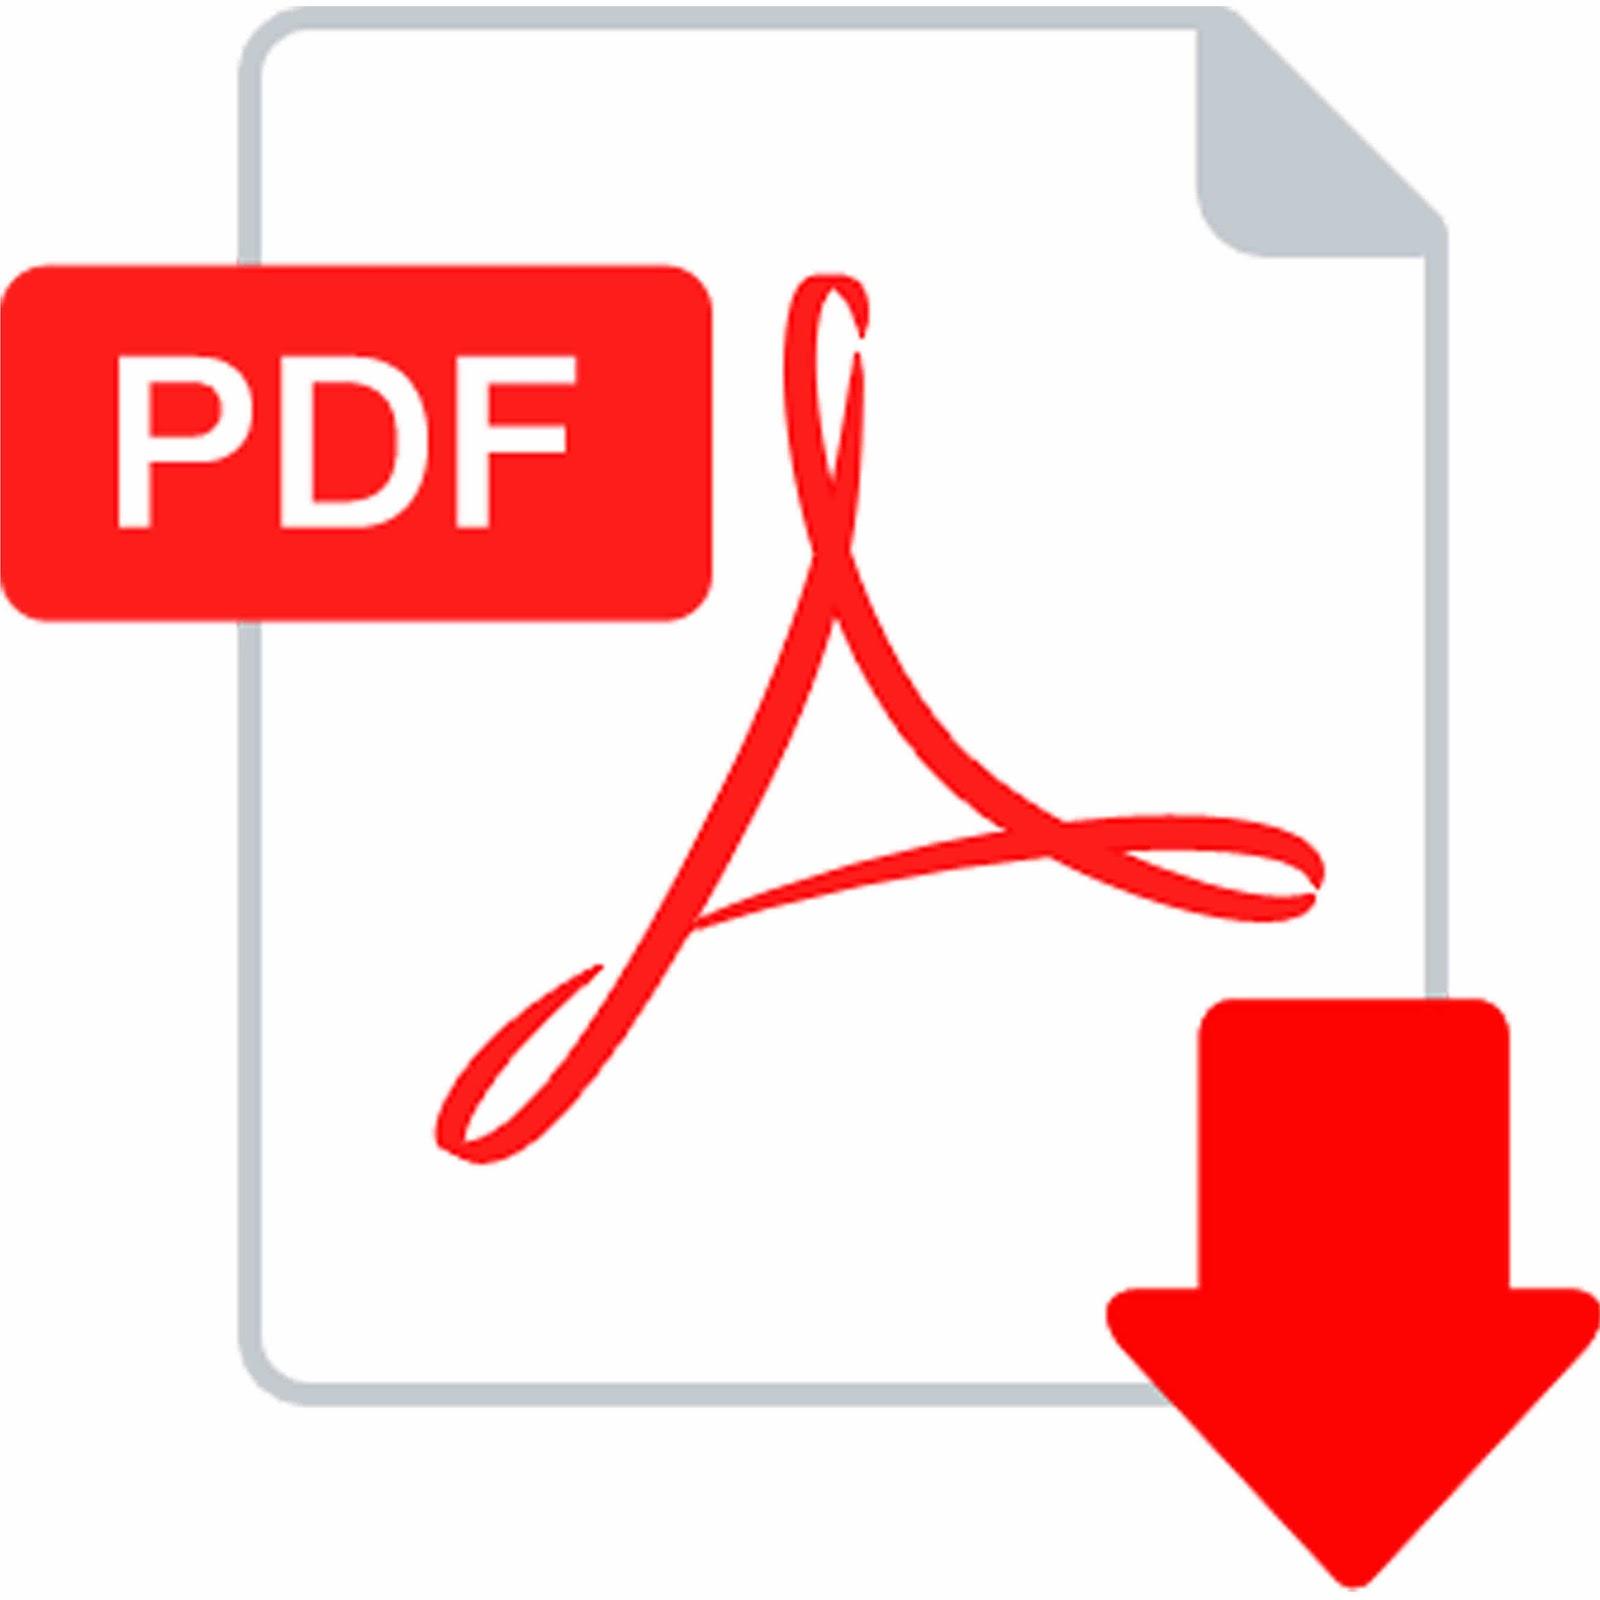 Pdf download mac